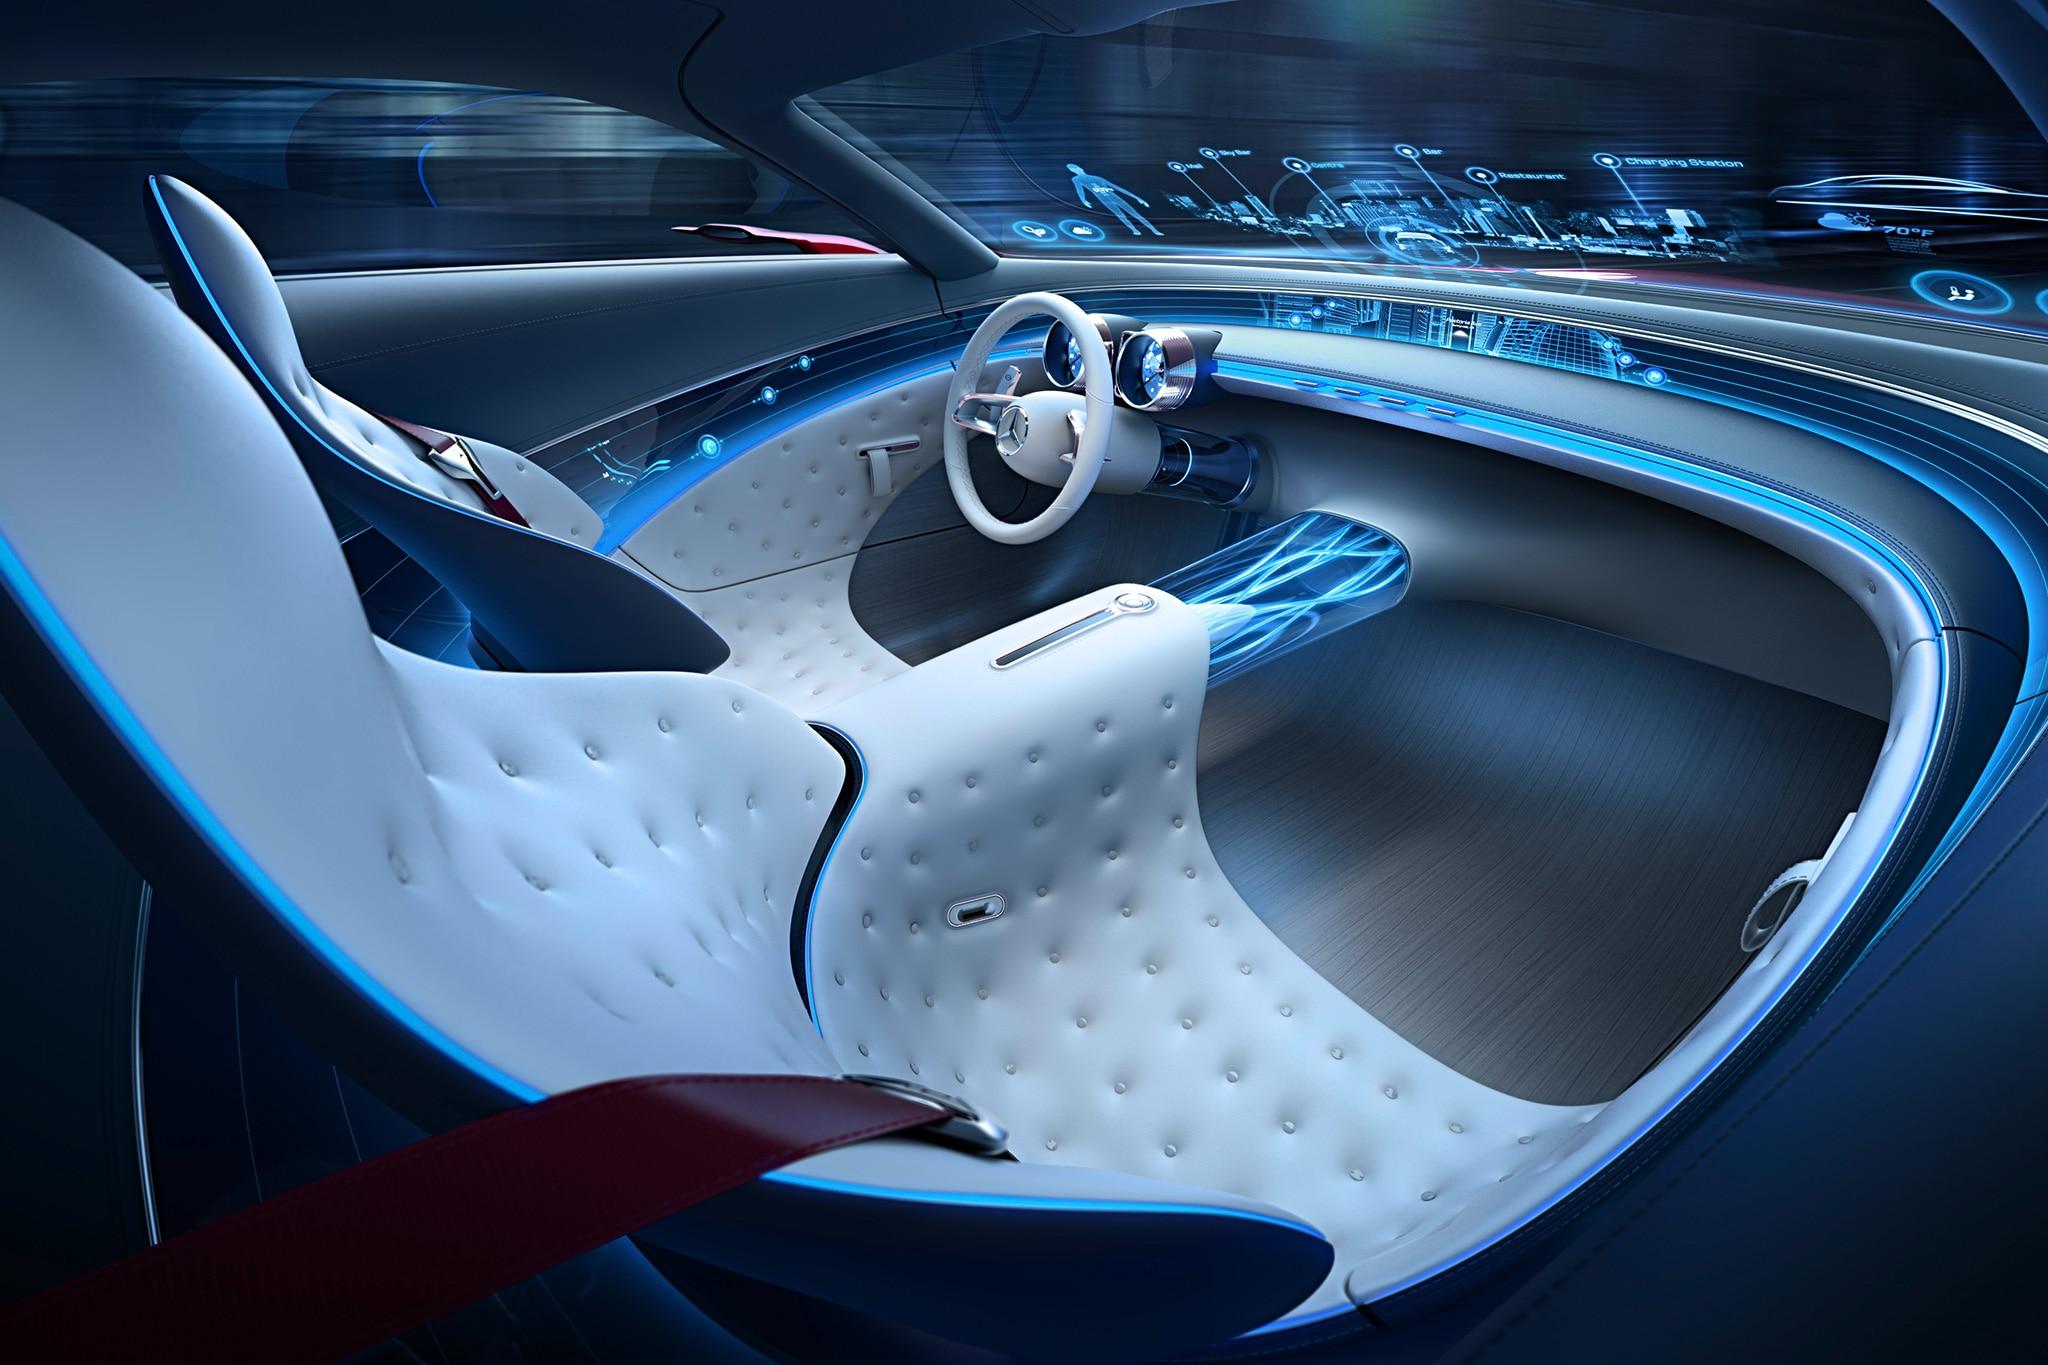 vision mercedes-maybach 6 concept stuns at pebble beach | automobile